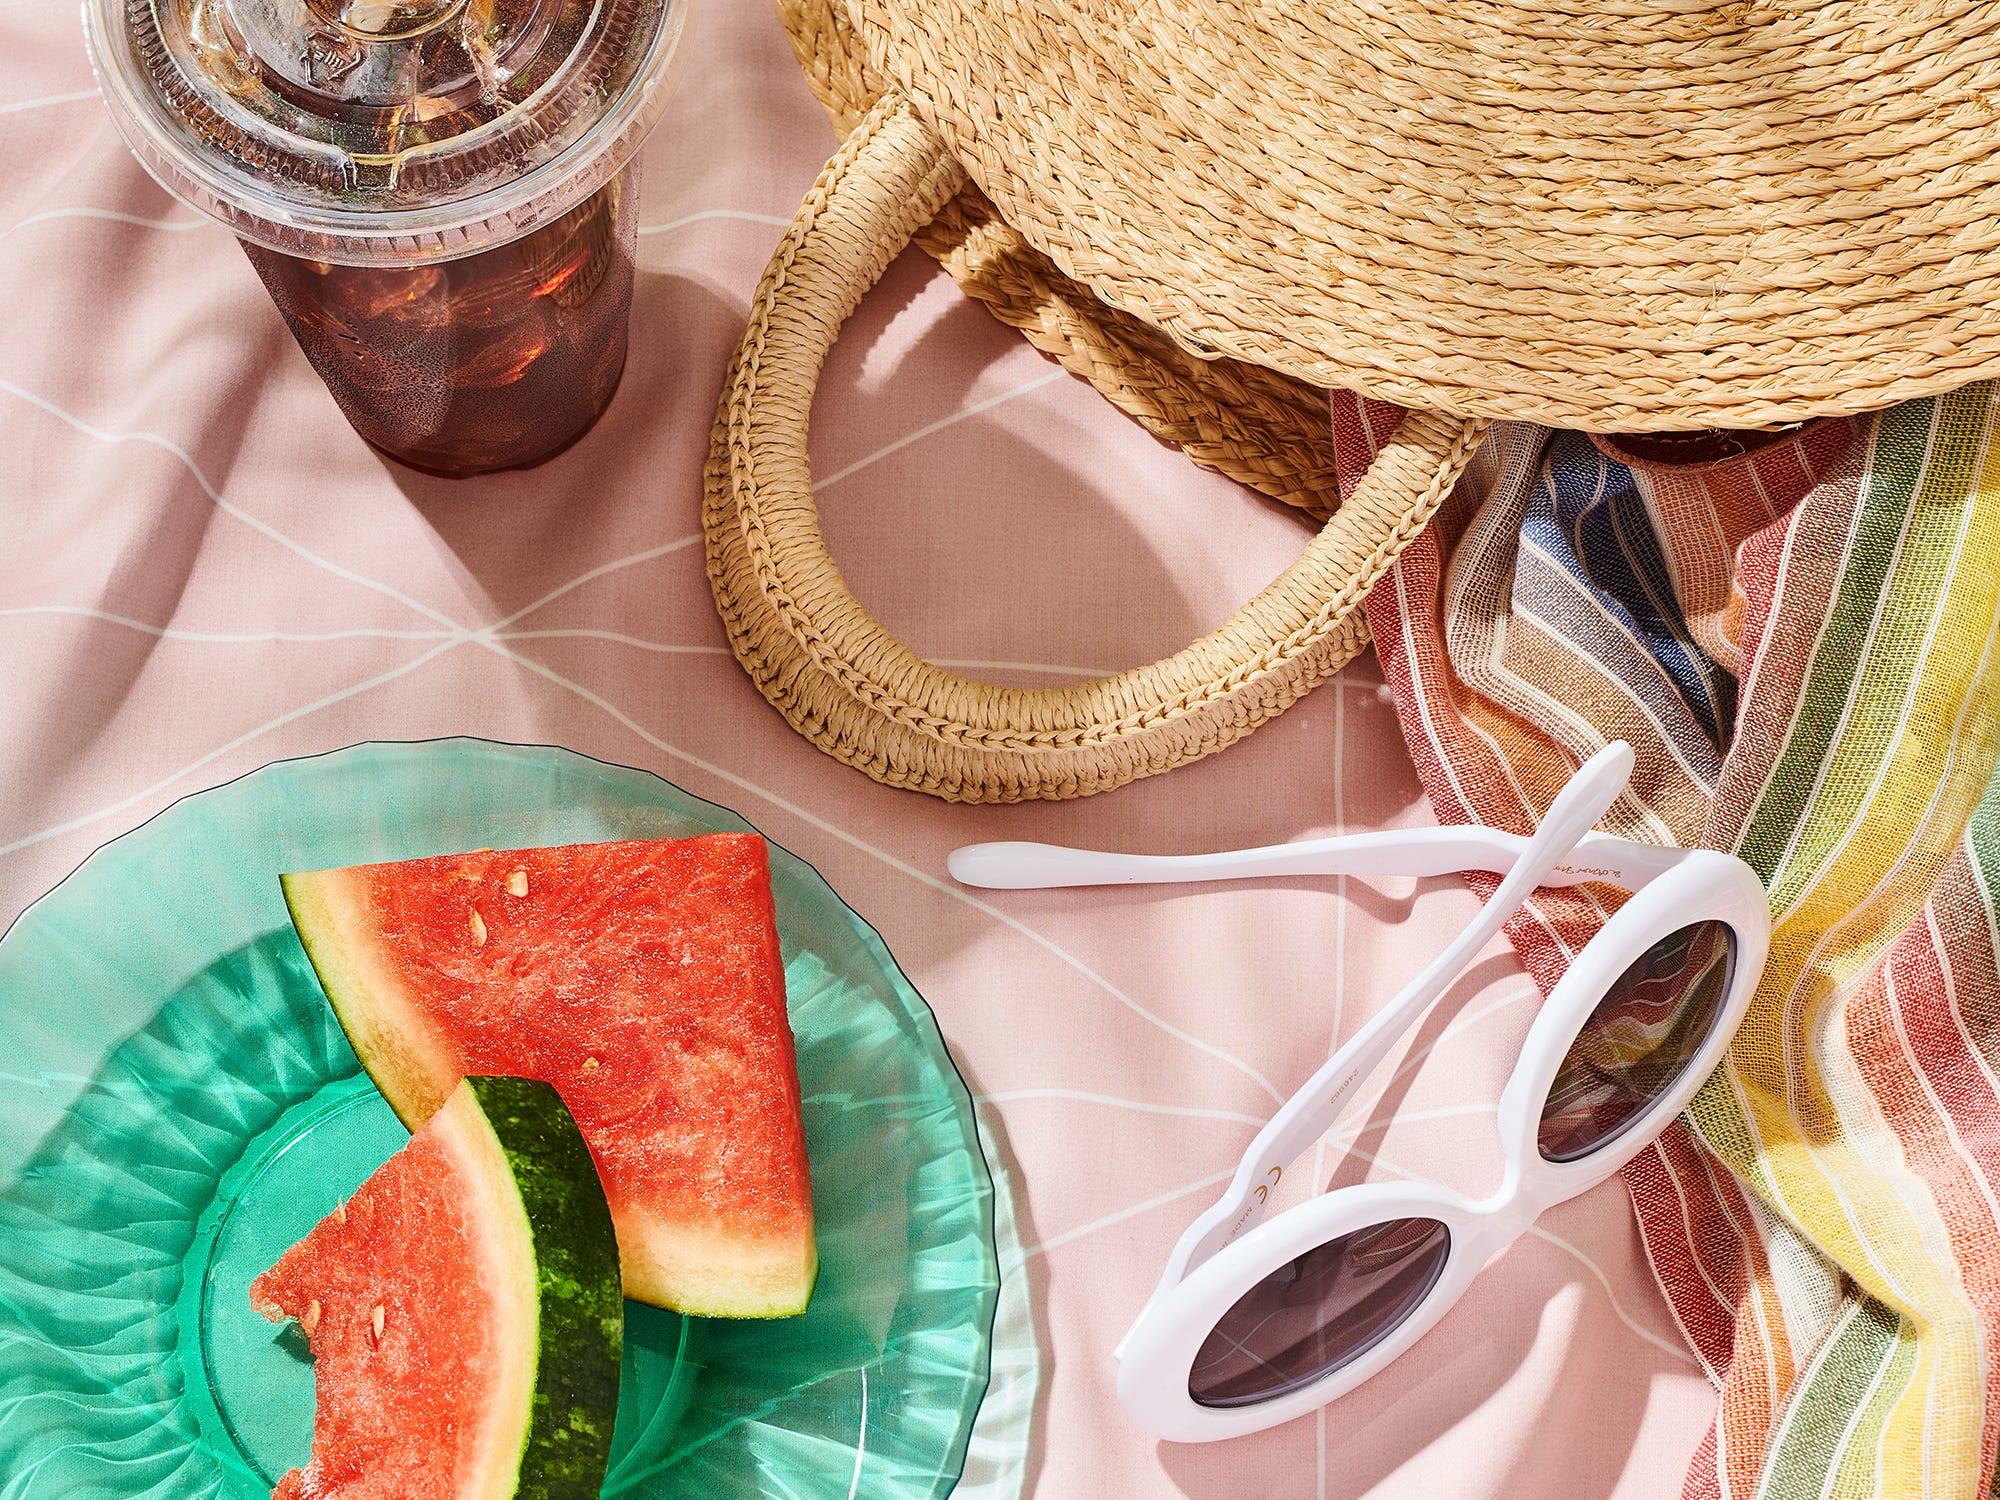 Celery Juice Health Benefits: Is It Good For You?